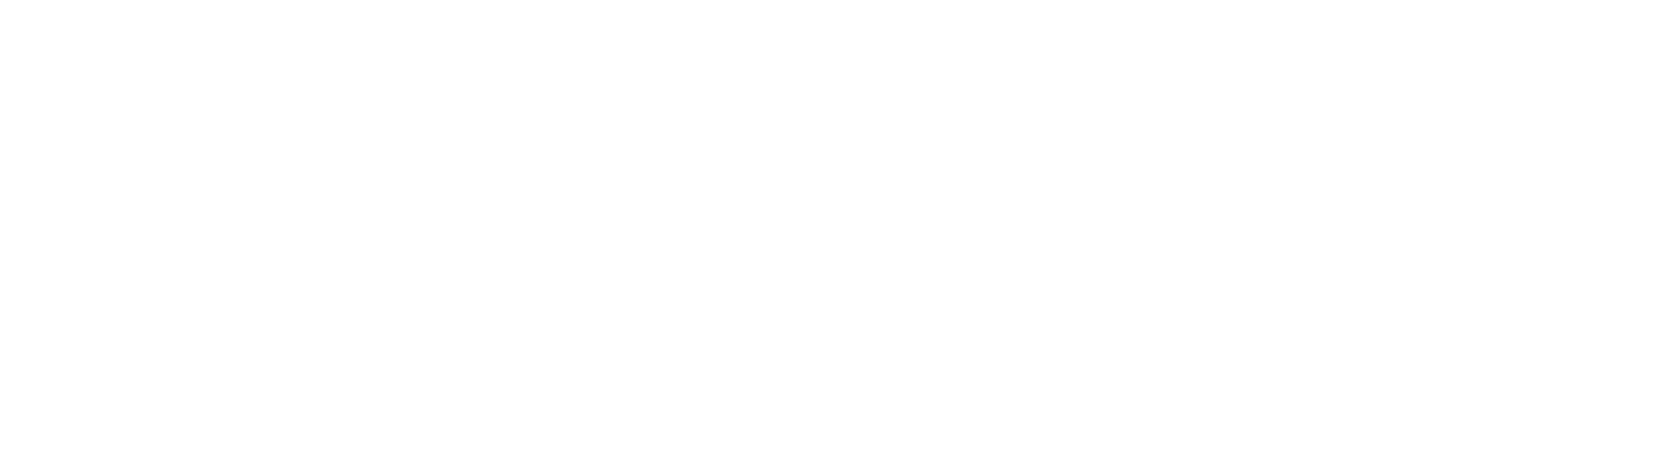 Connecticut Airport Authority logo